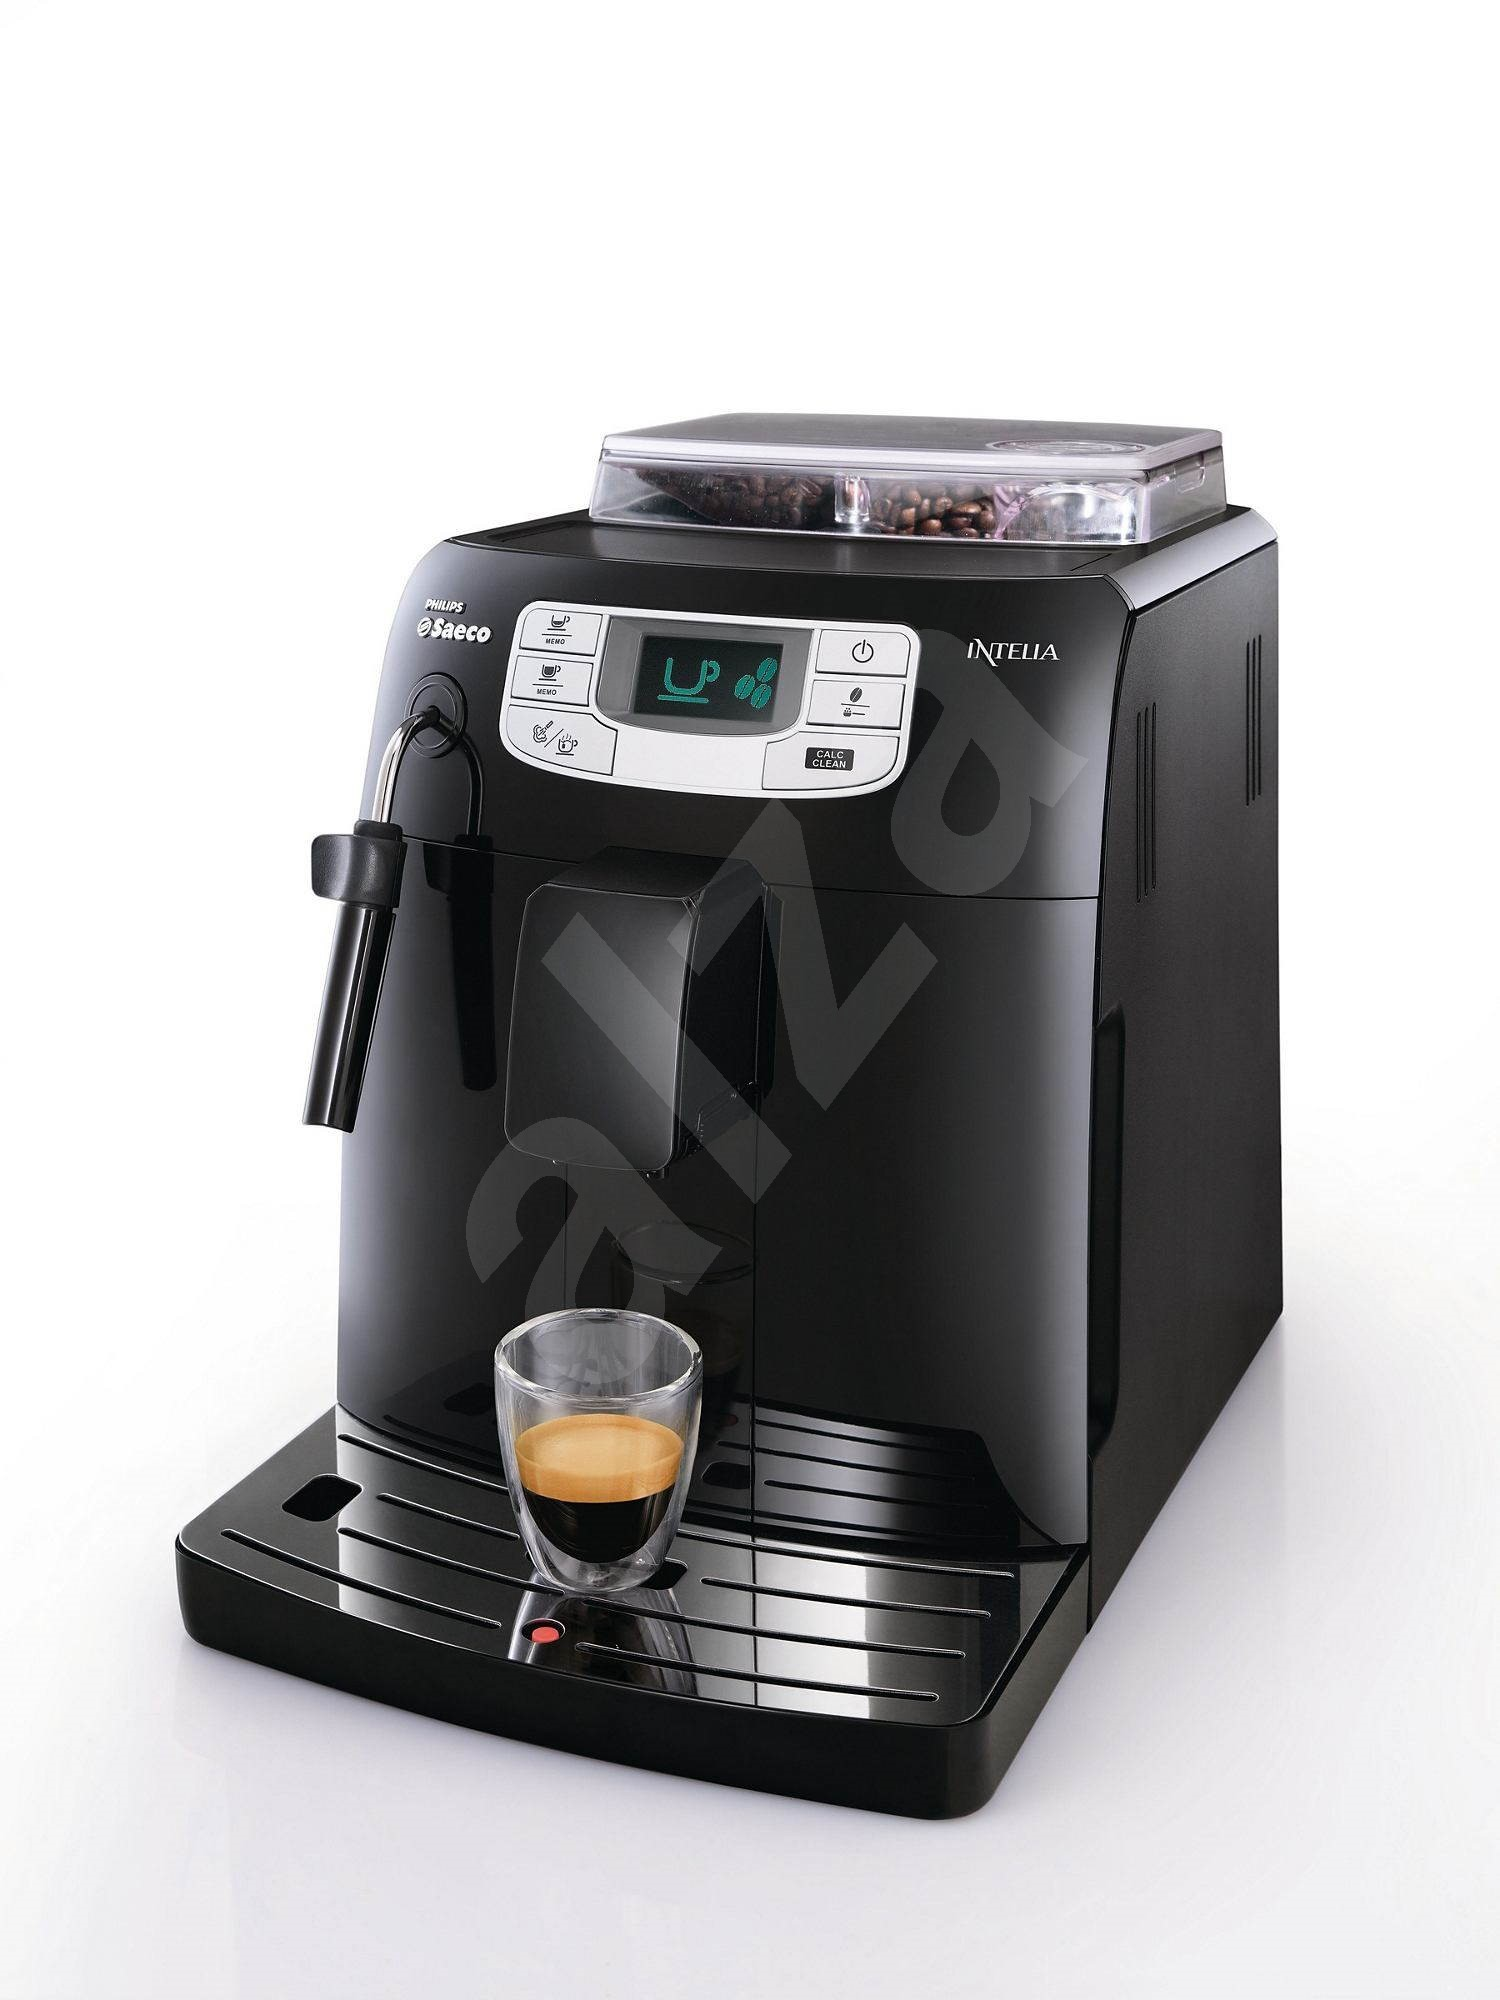 philips saeco hd8751 19 intelia espresso machine. Black Bedroom Furniture Sets. Home Design Ideas